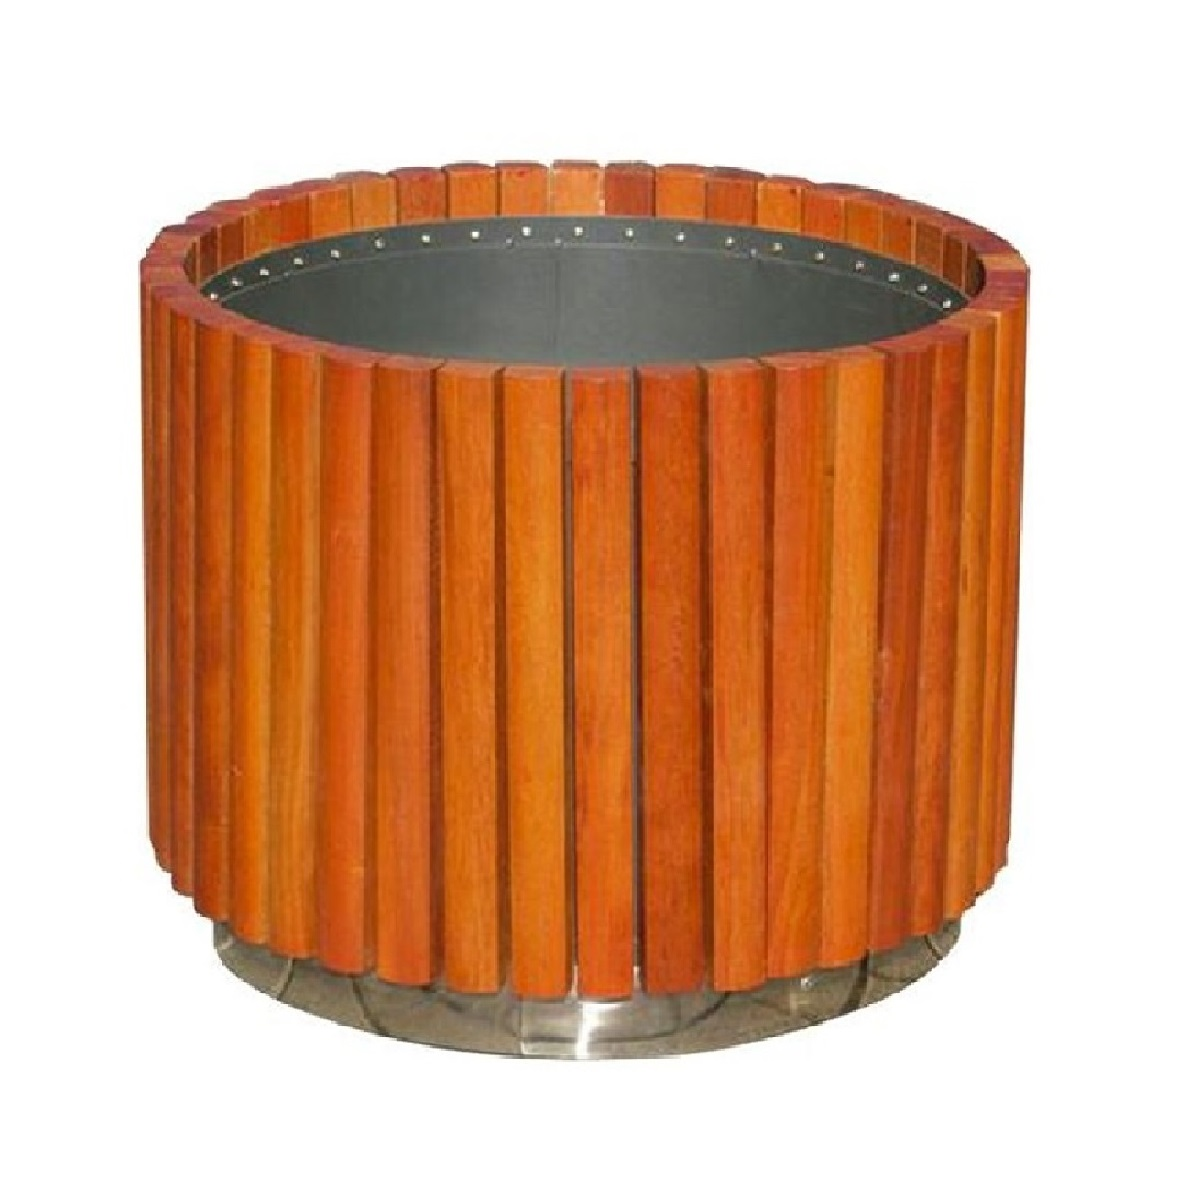 Jardinera circular con listones de madera newport J-9